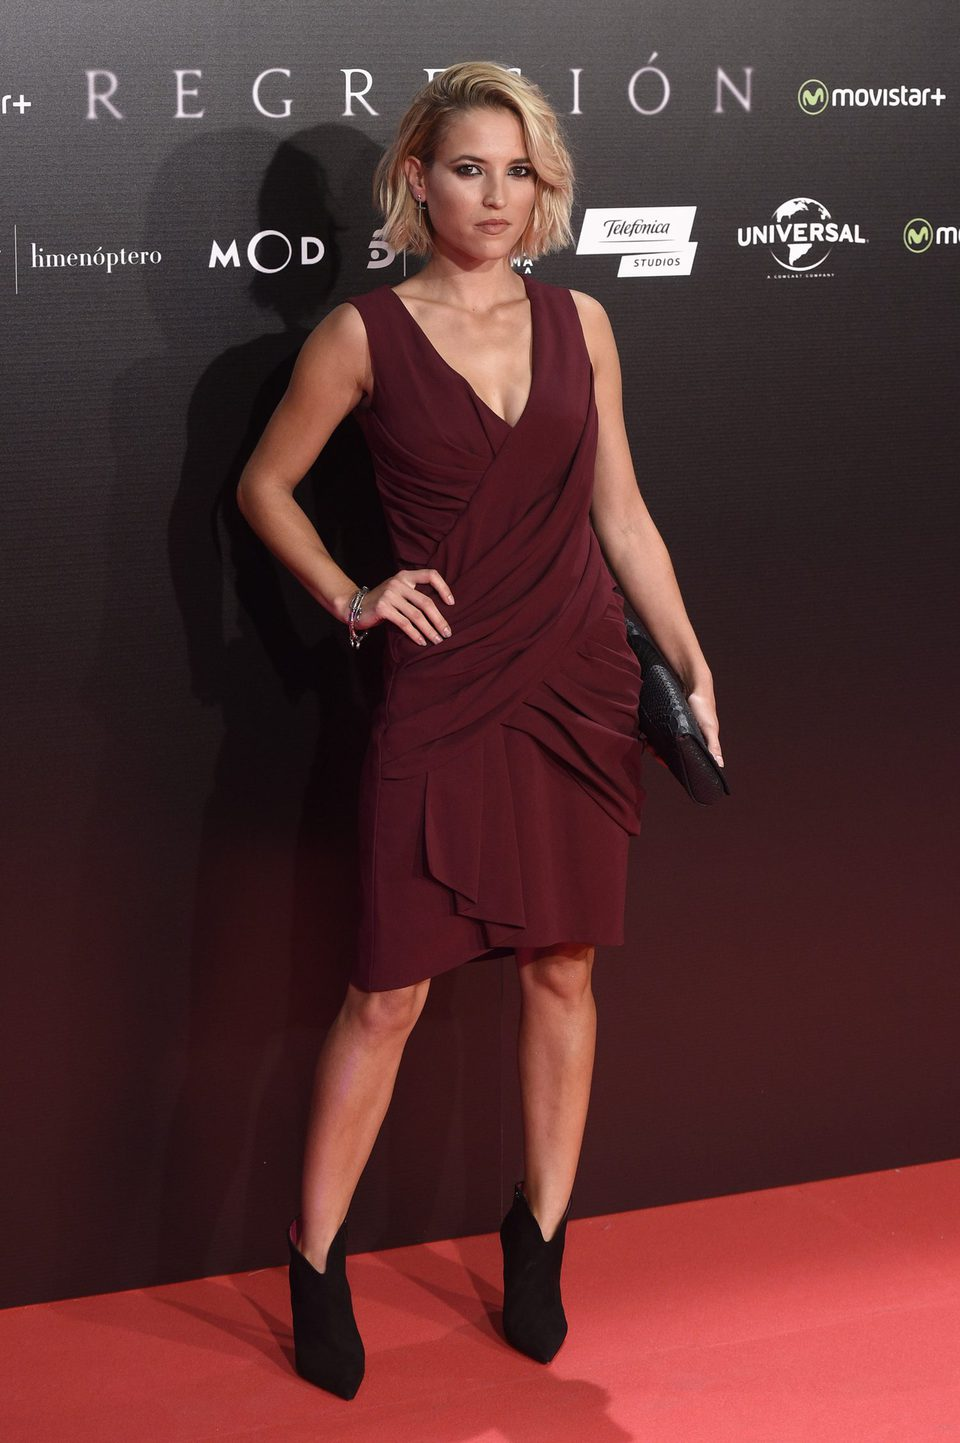 Ana Fernández García ana fernández garcía at 'regression' premiere in madrid